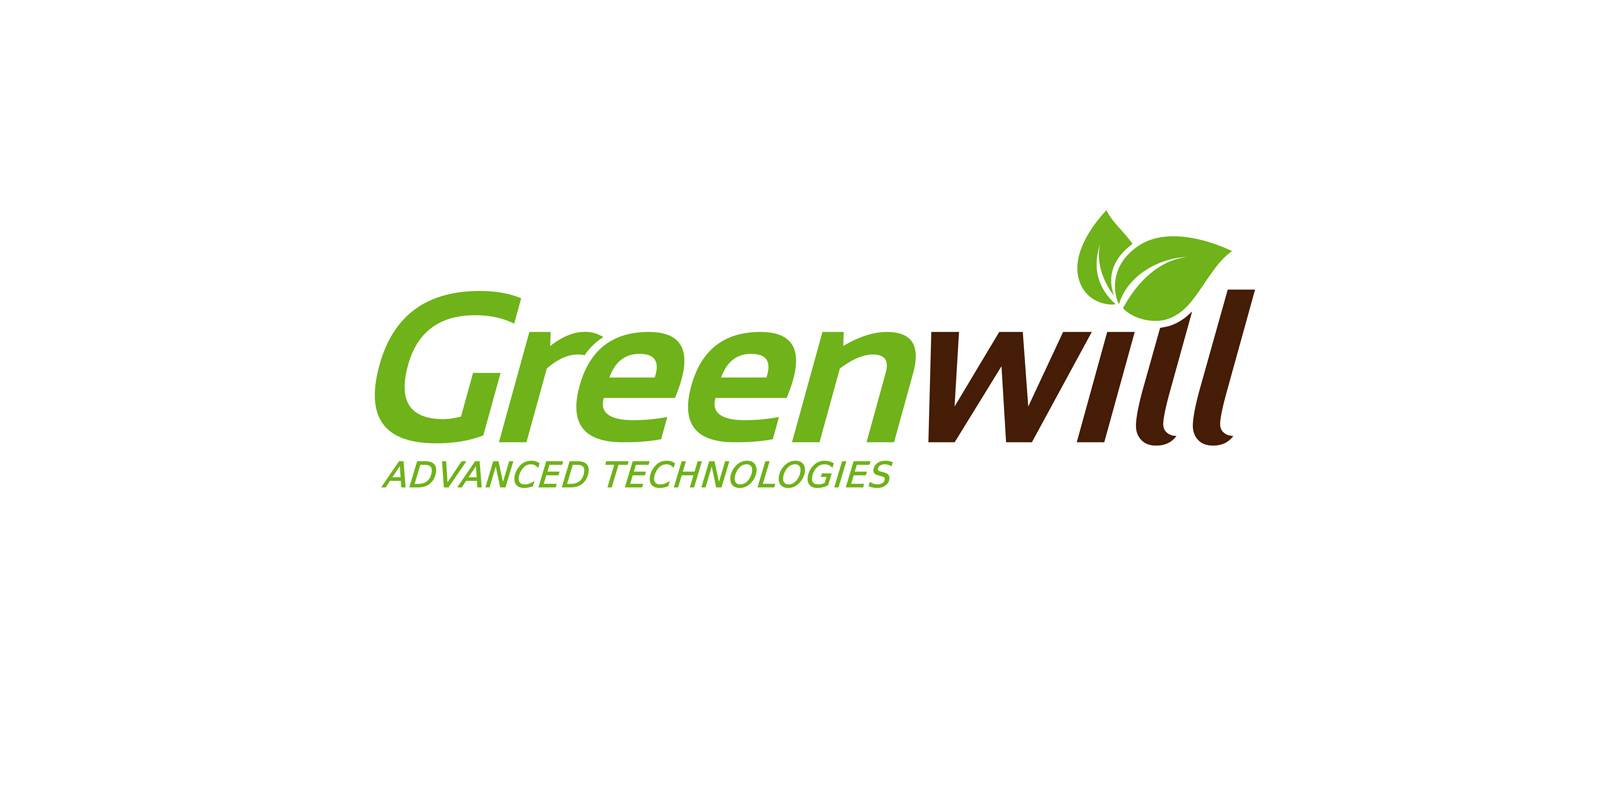 Аграрная компания Greenwill;;;;;;Разработка логотипа;;;;;;<span>Клиент:</span> Аграрная компания Greenwill;;;;;;;;;;;;Разработка логотипа;;;;;;1